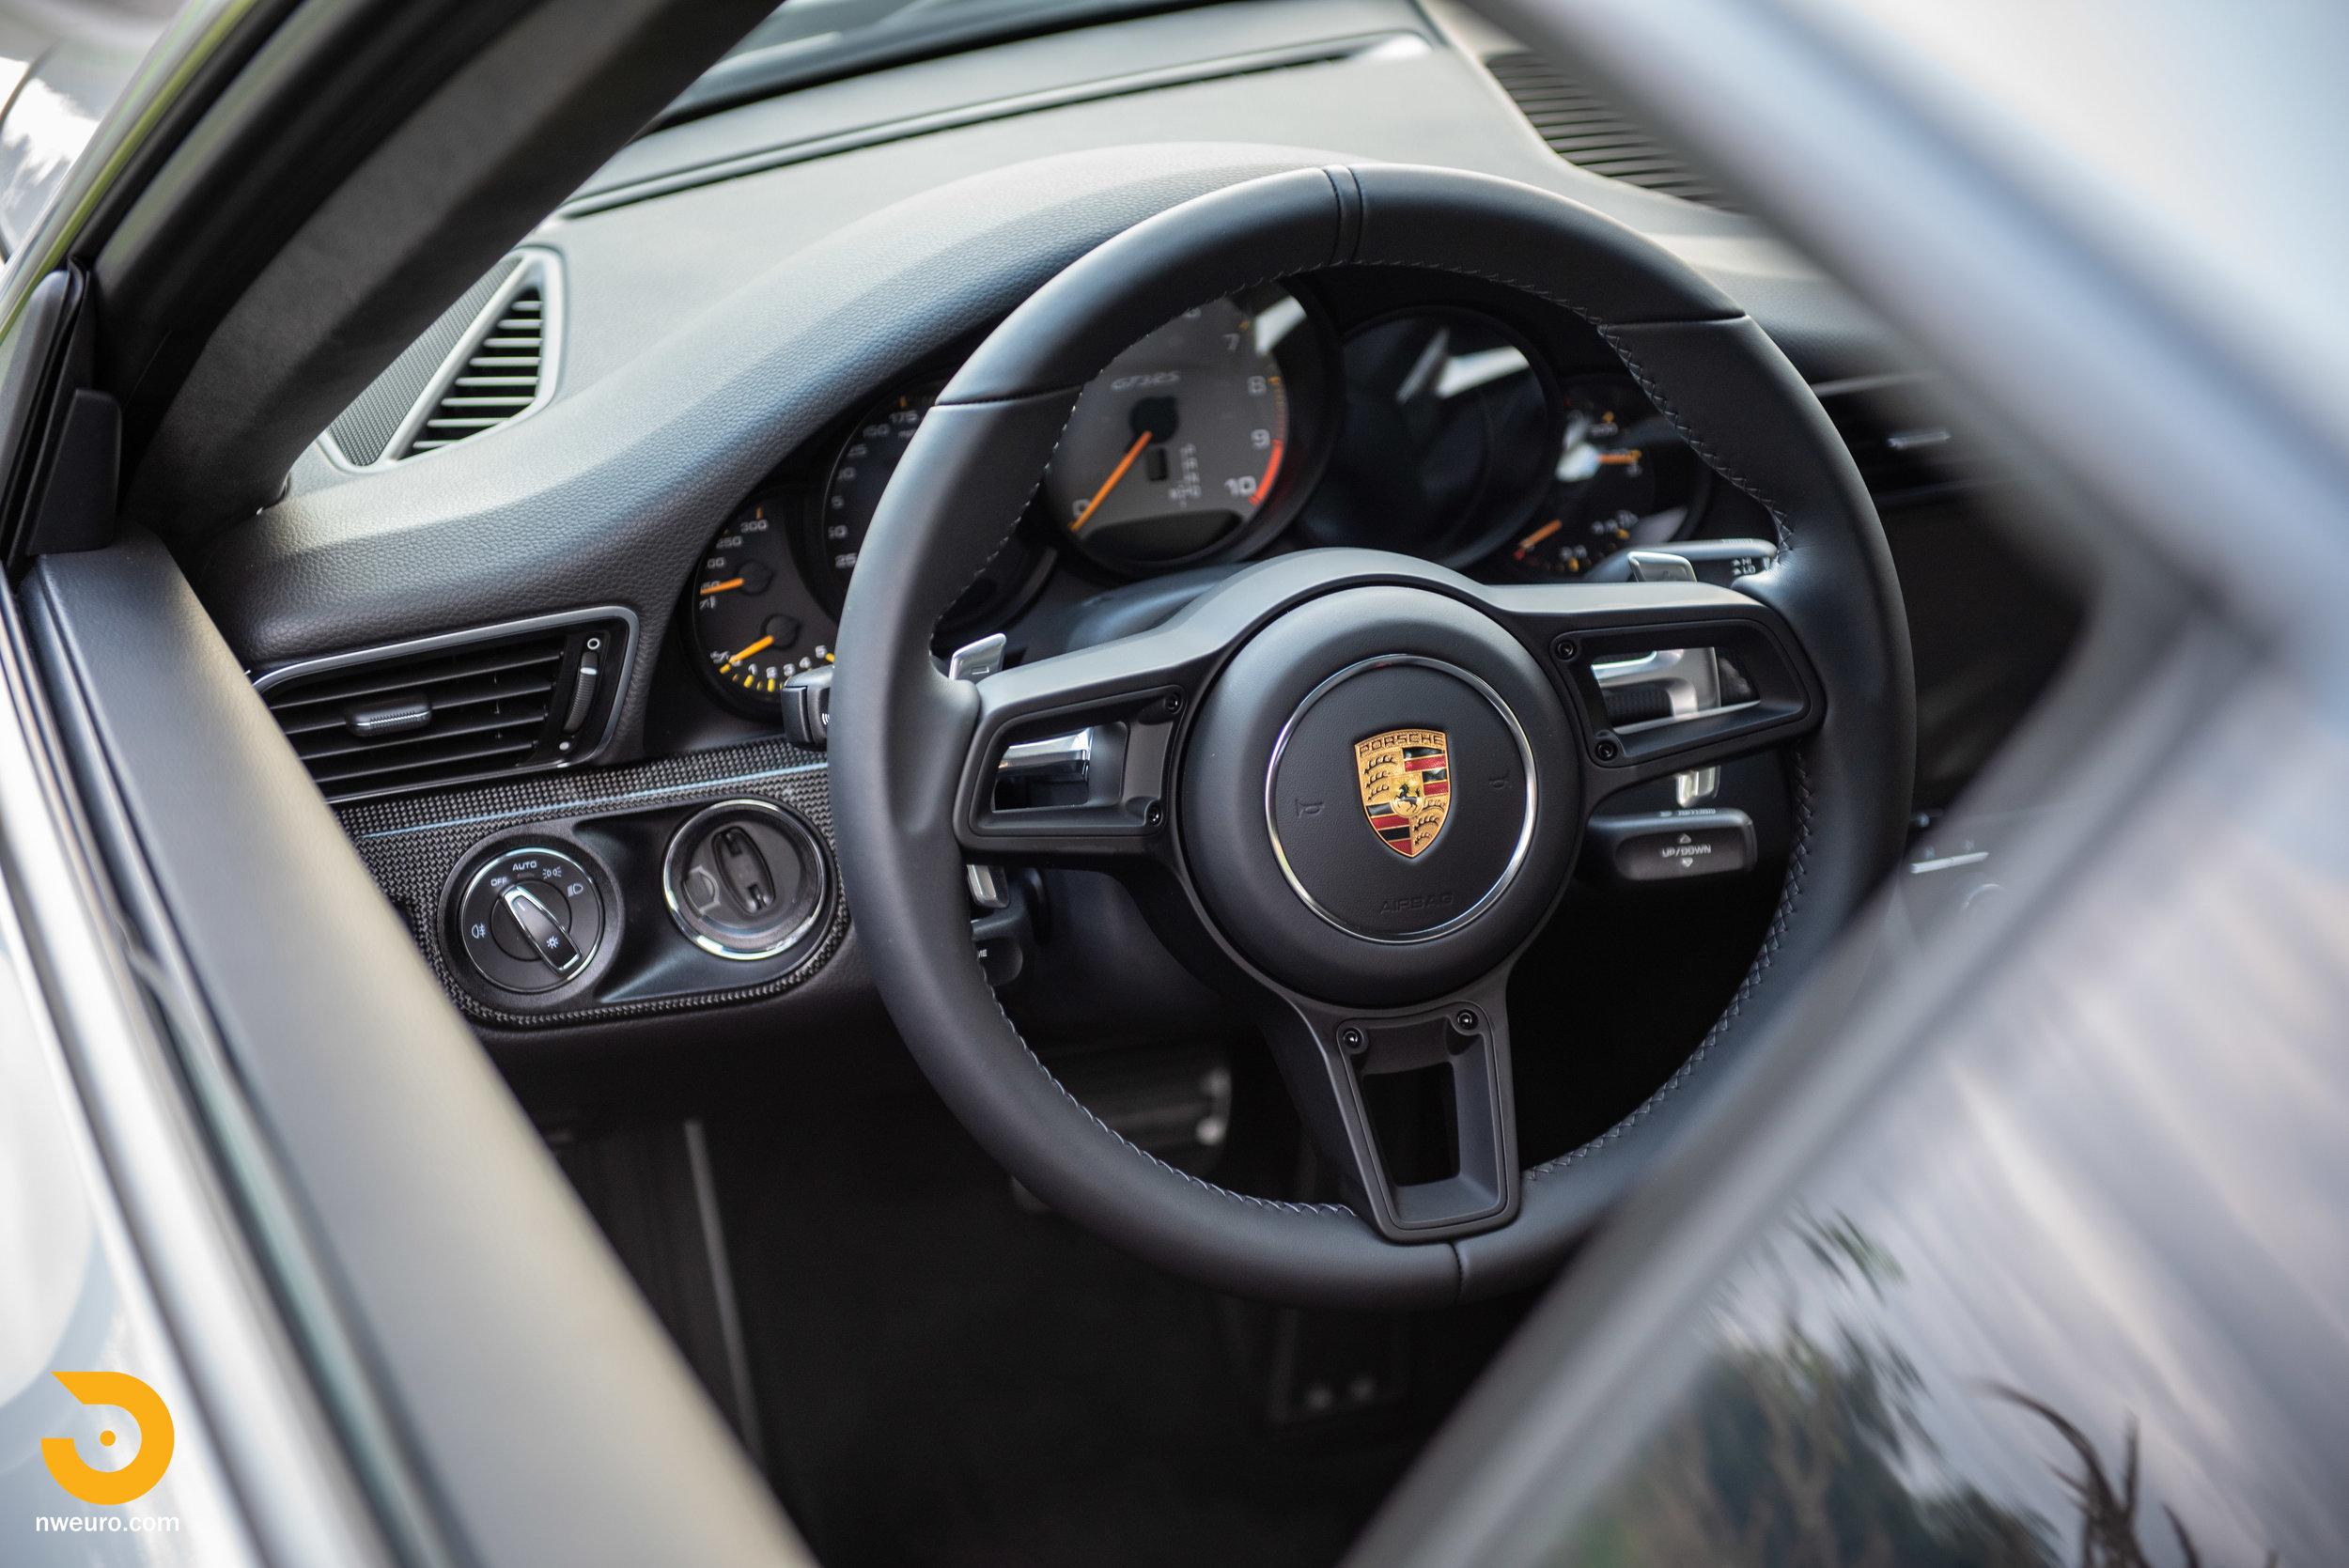 2019 Porsche GT3 RS - Chalk-72.jpg